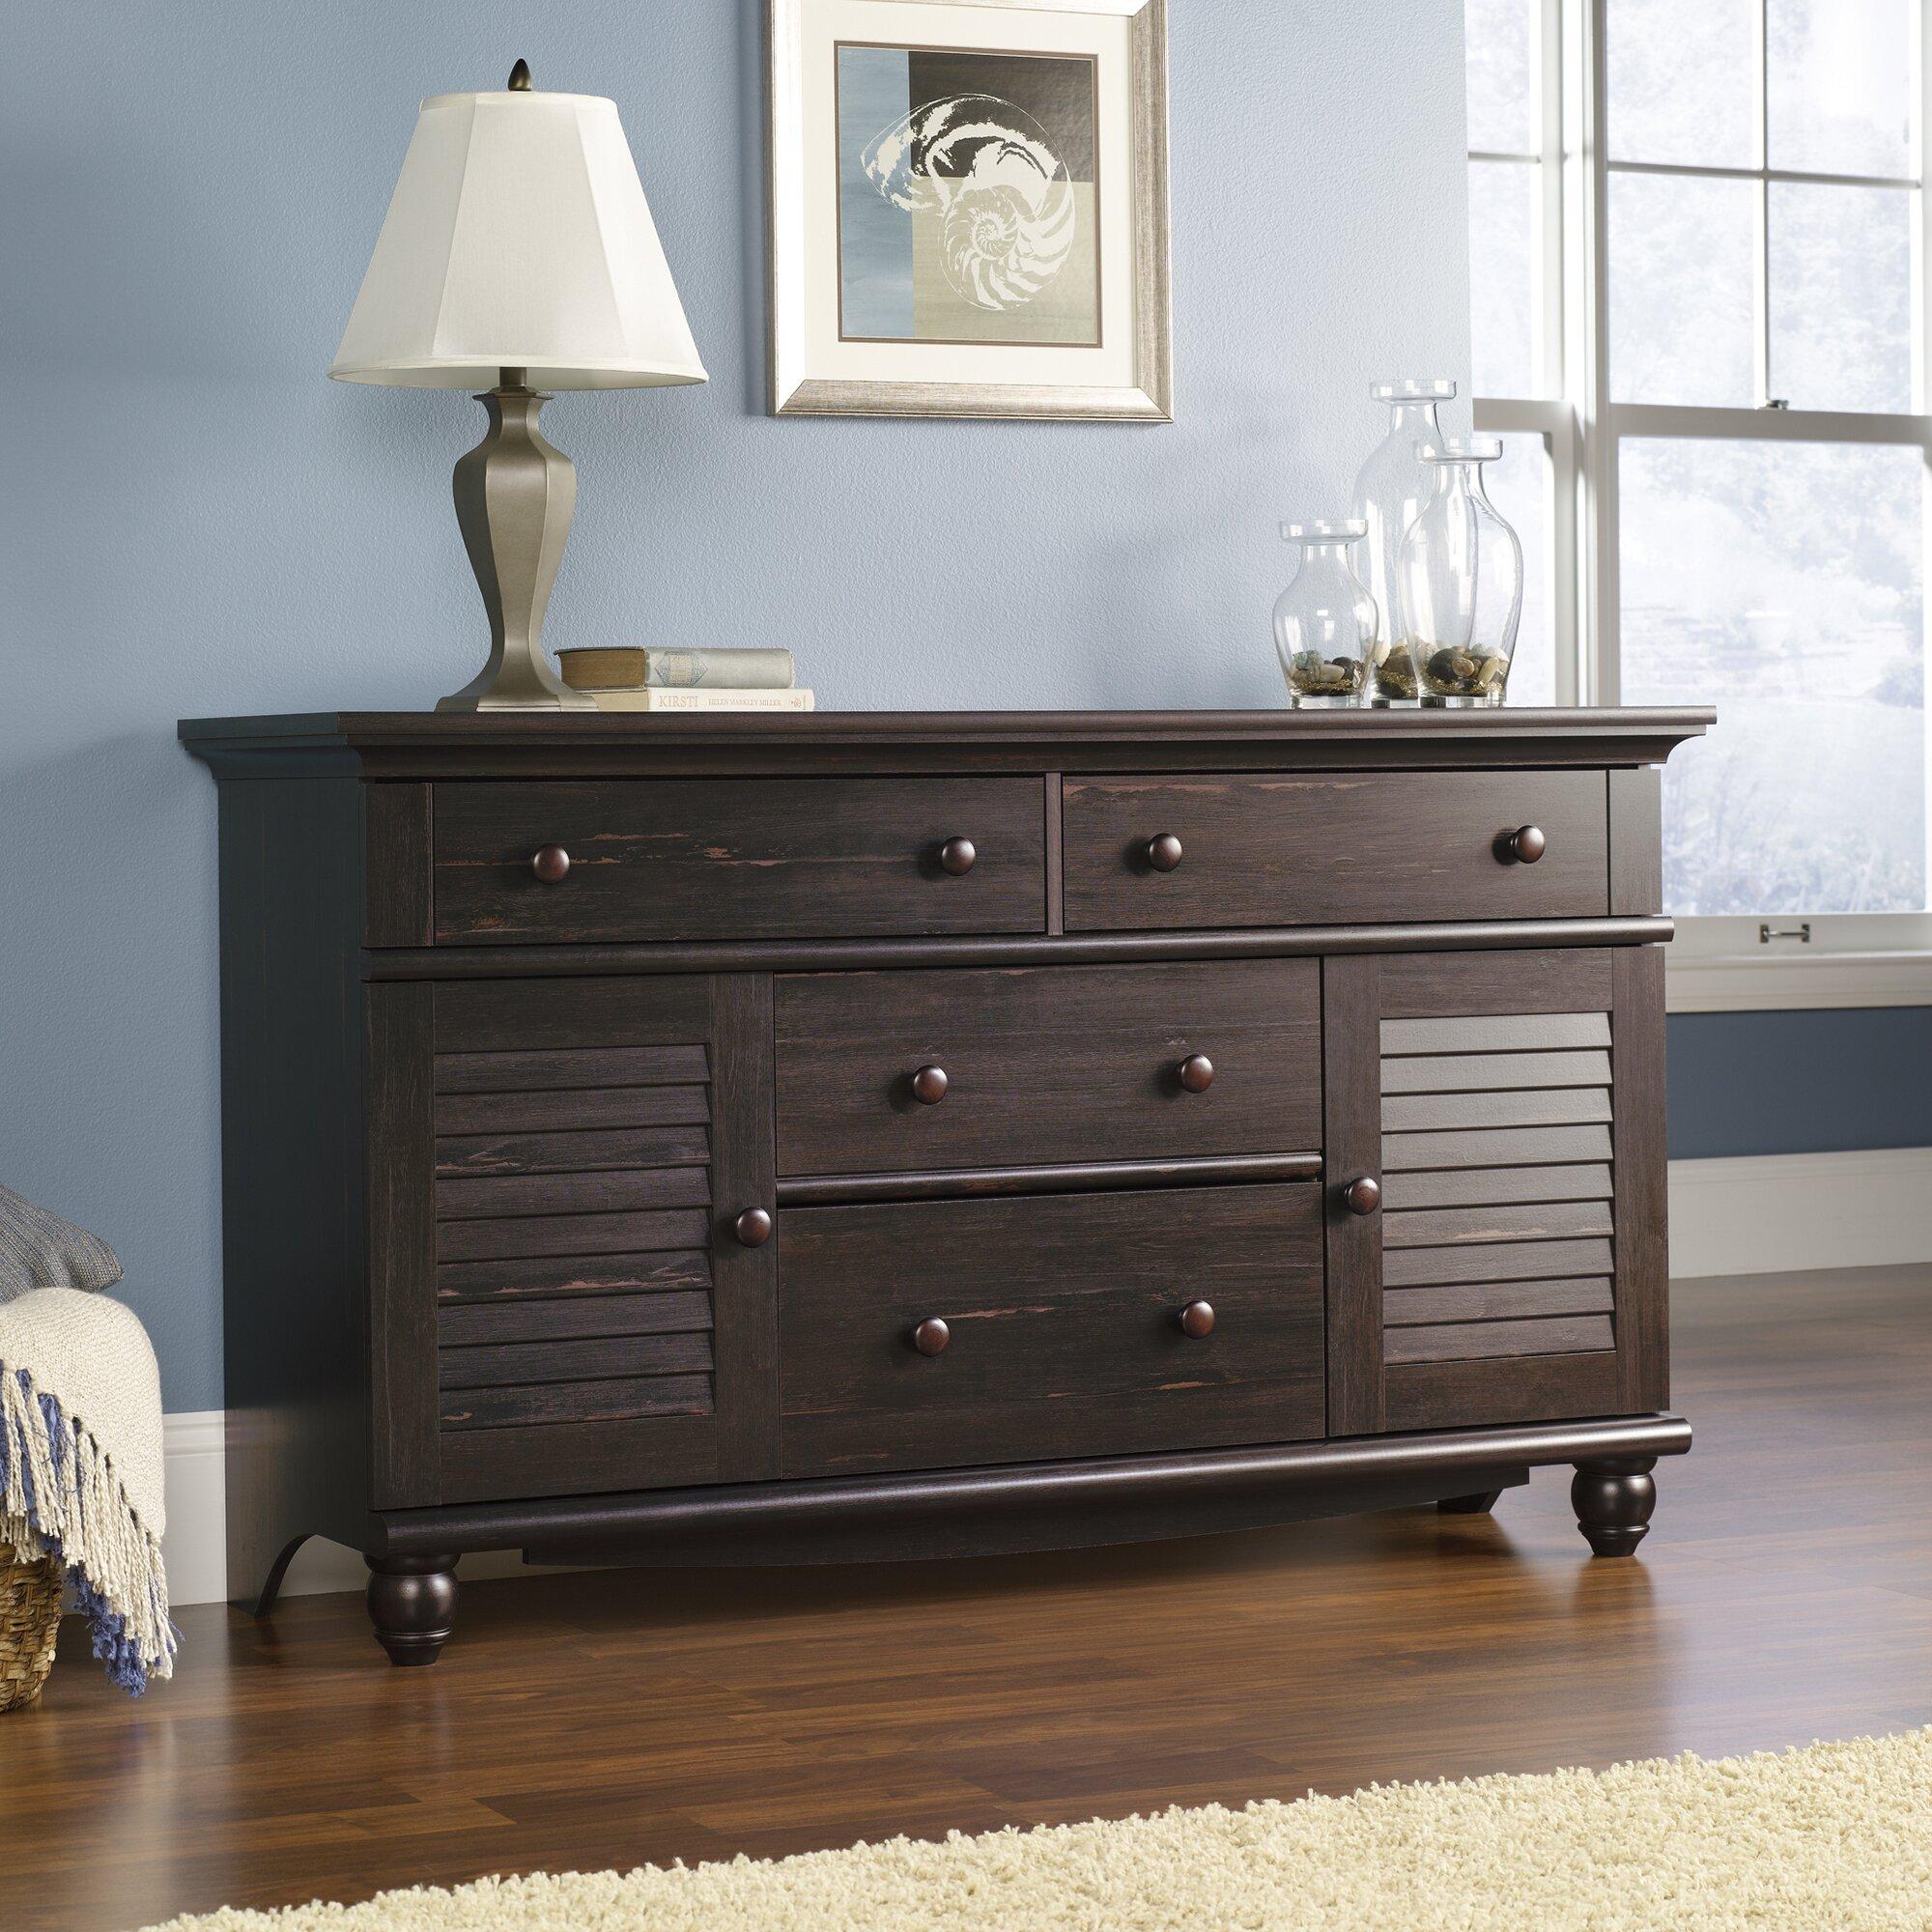 beachcrest home pinellas 4 drawer combo dresser reviews wayfair. Black Bedroom Furniture Sets. Home Design Ideas